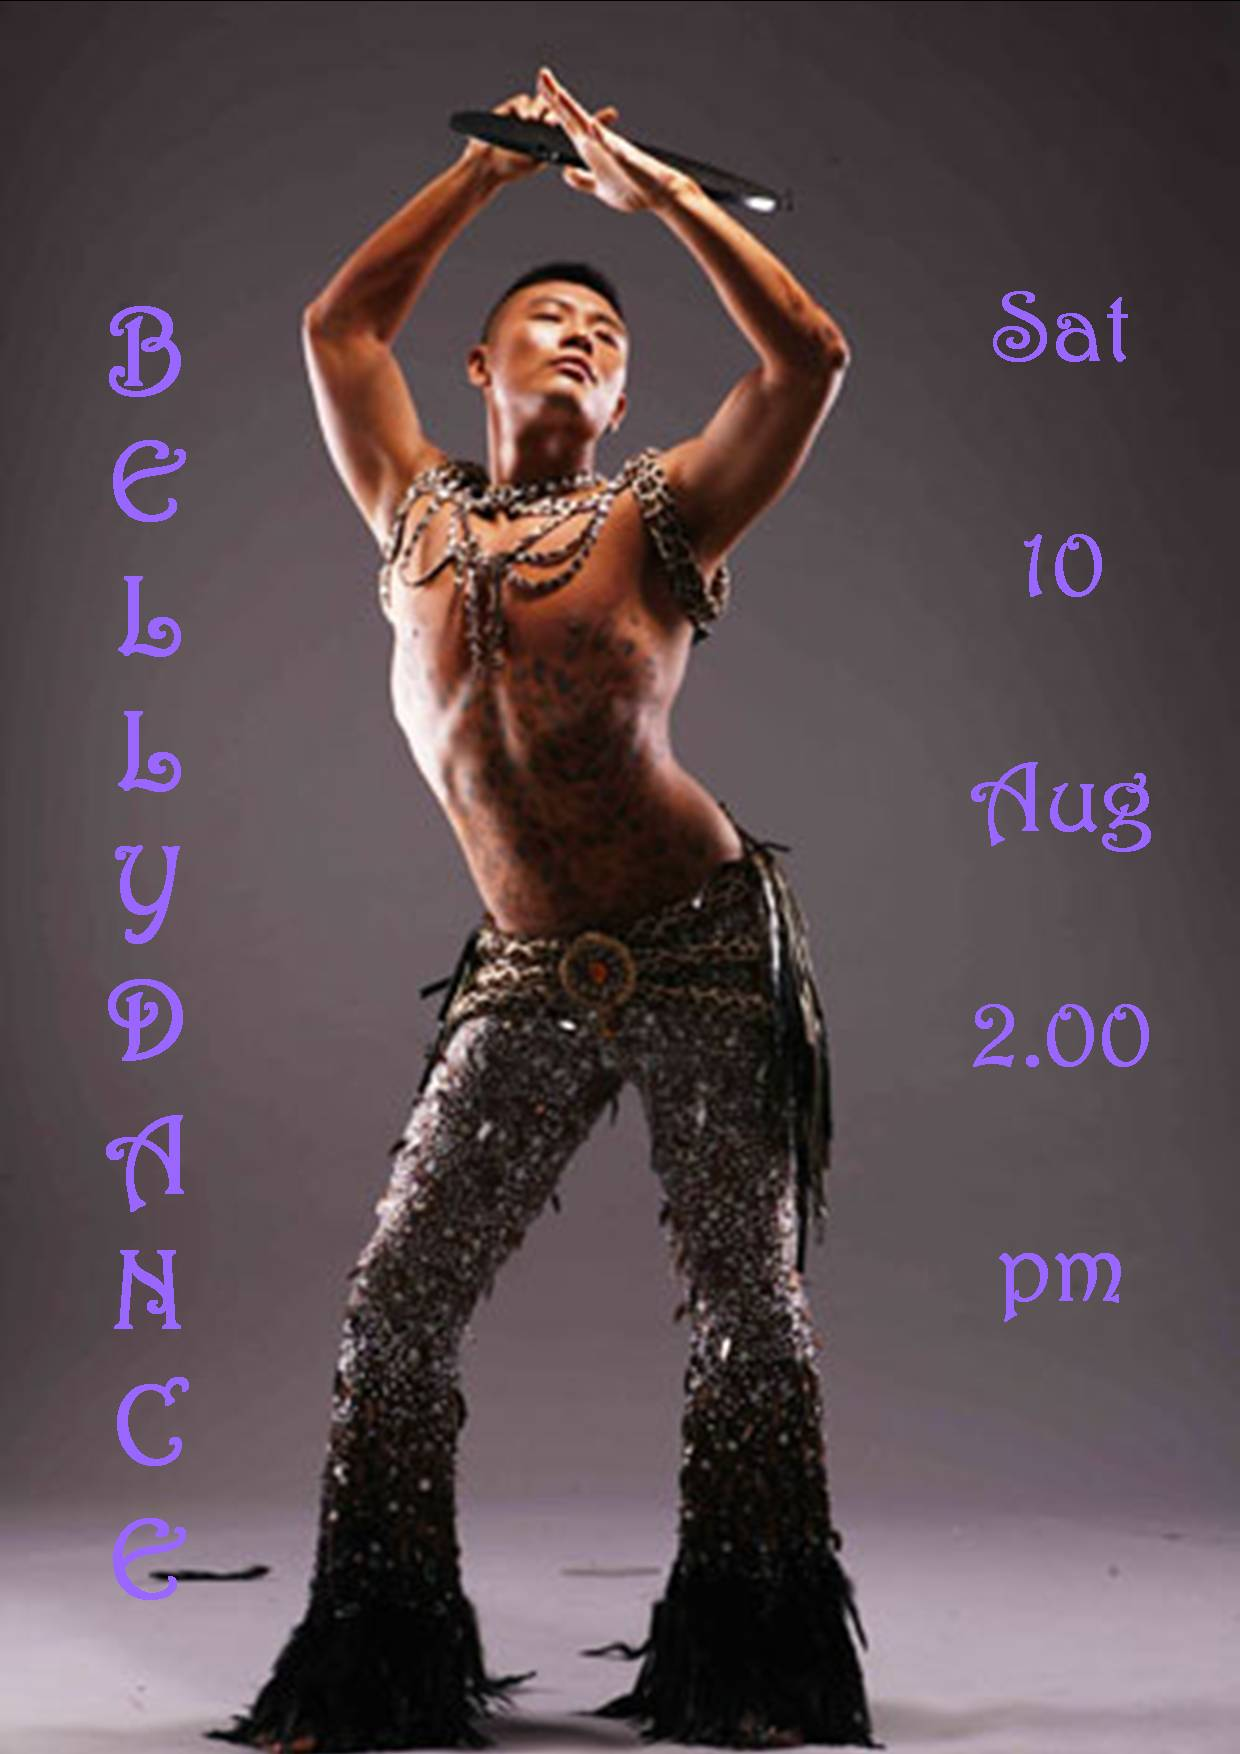 BELLYDANCE SAT 10 AUG 2.00PM 2019